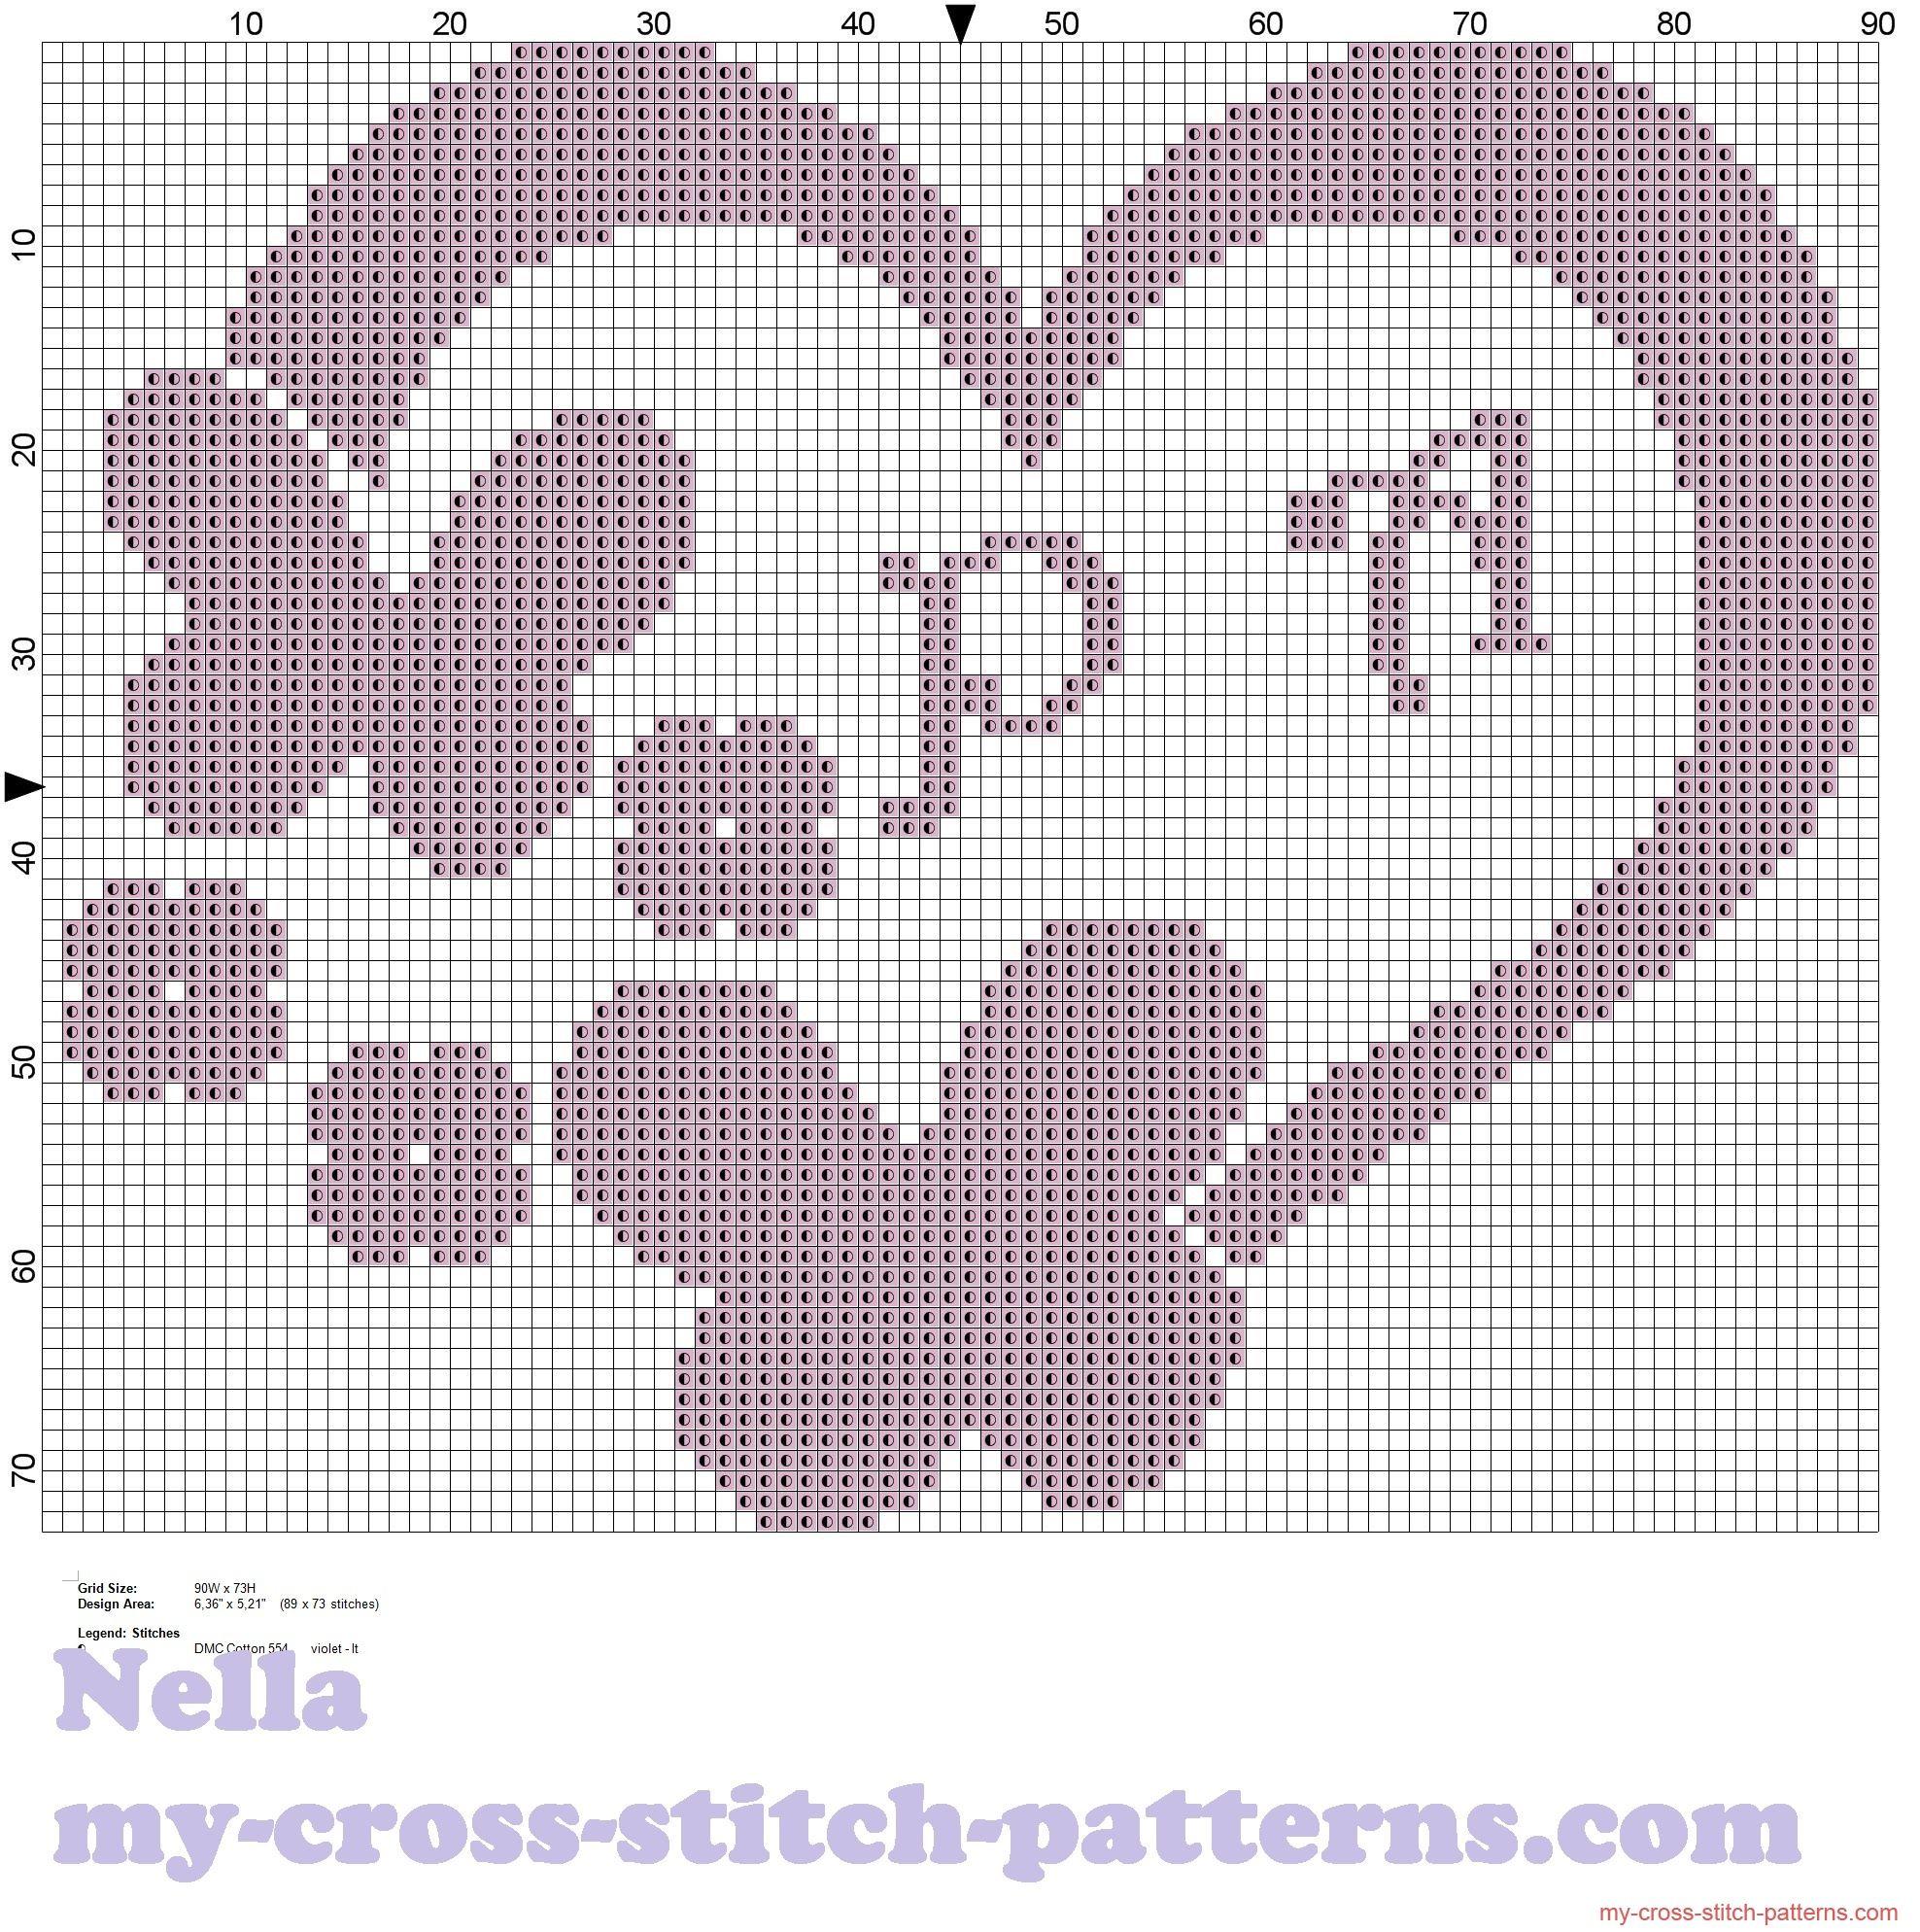 Cojines para anillos corazon con mariposas monocromo | BORDADO ...